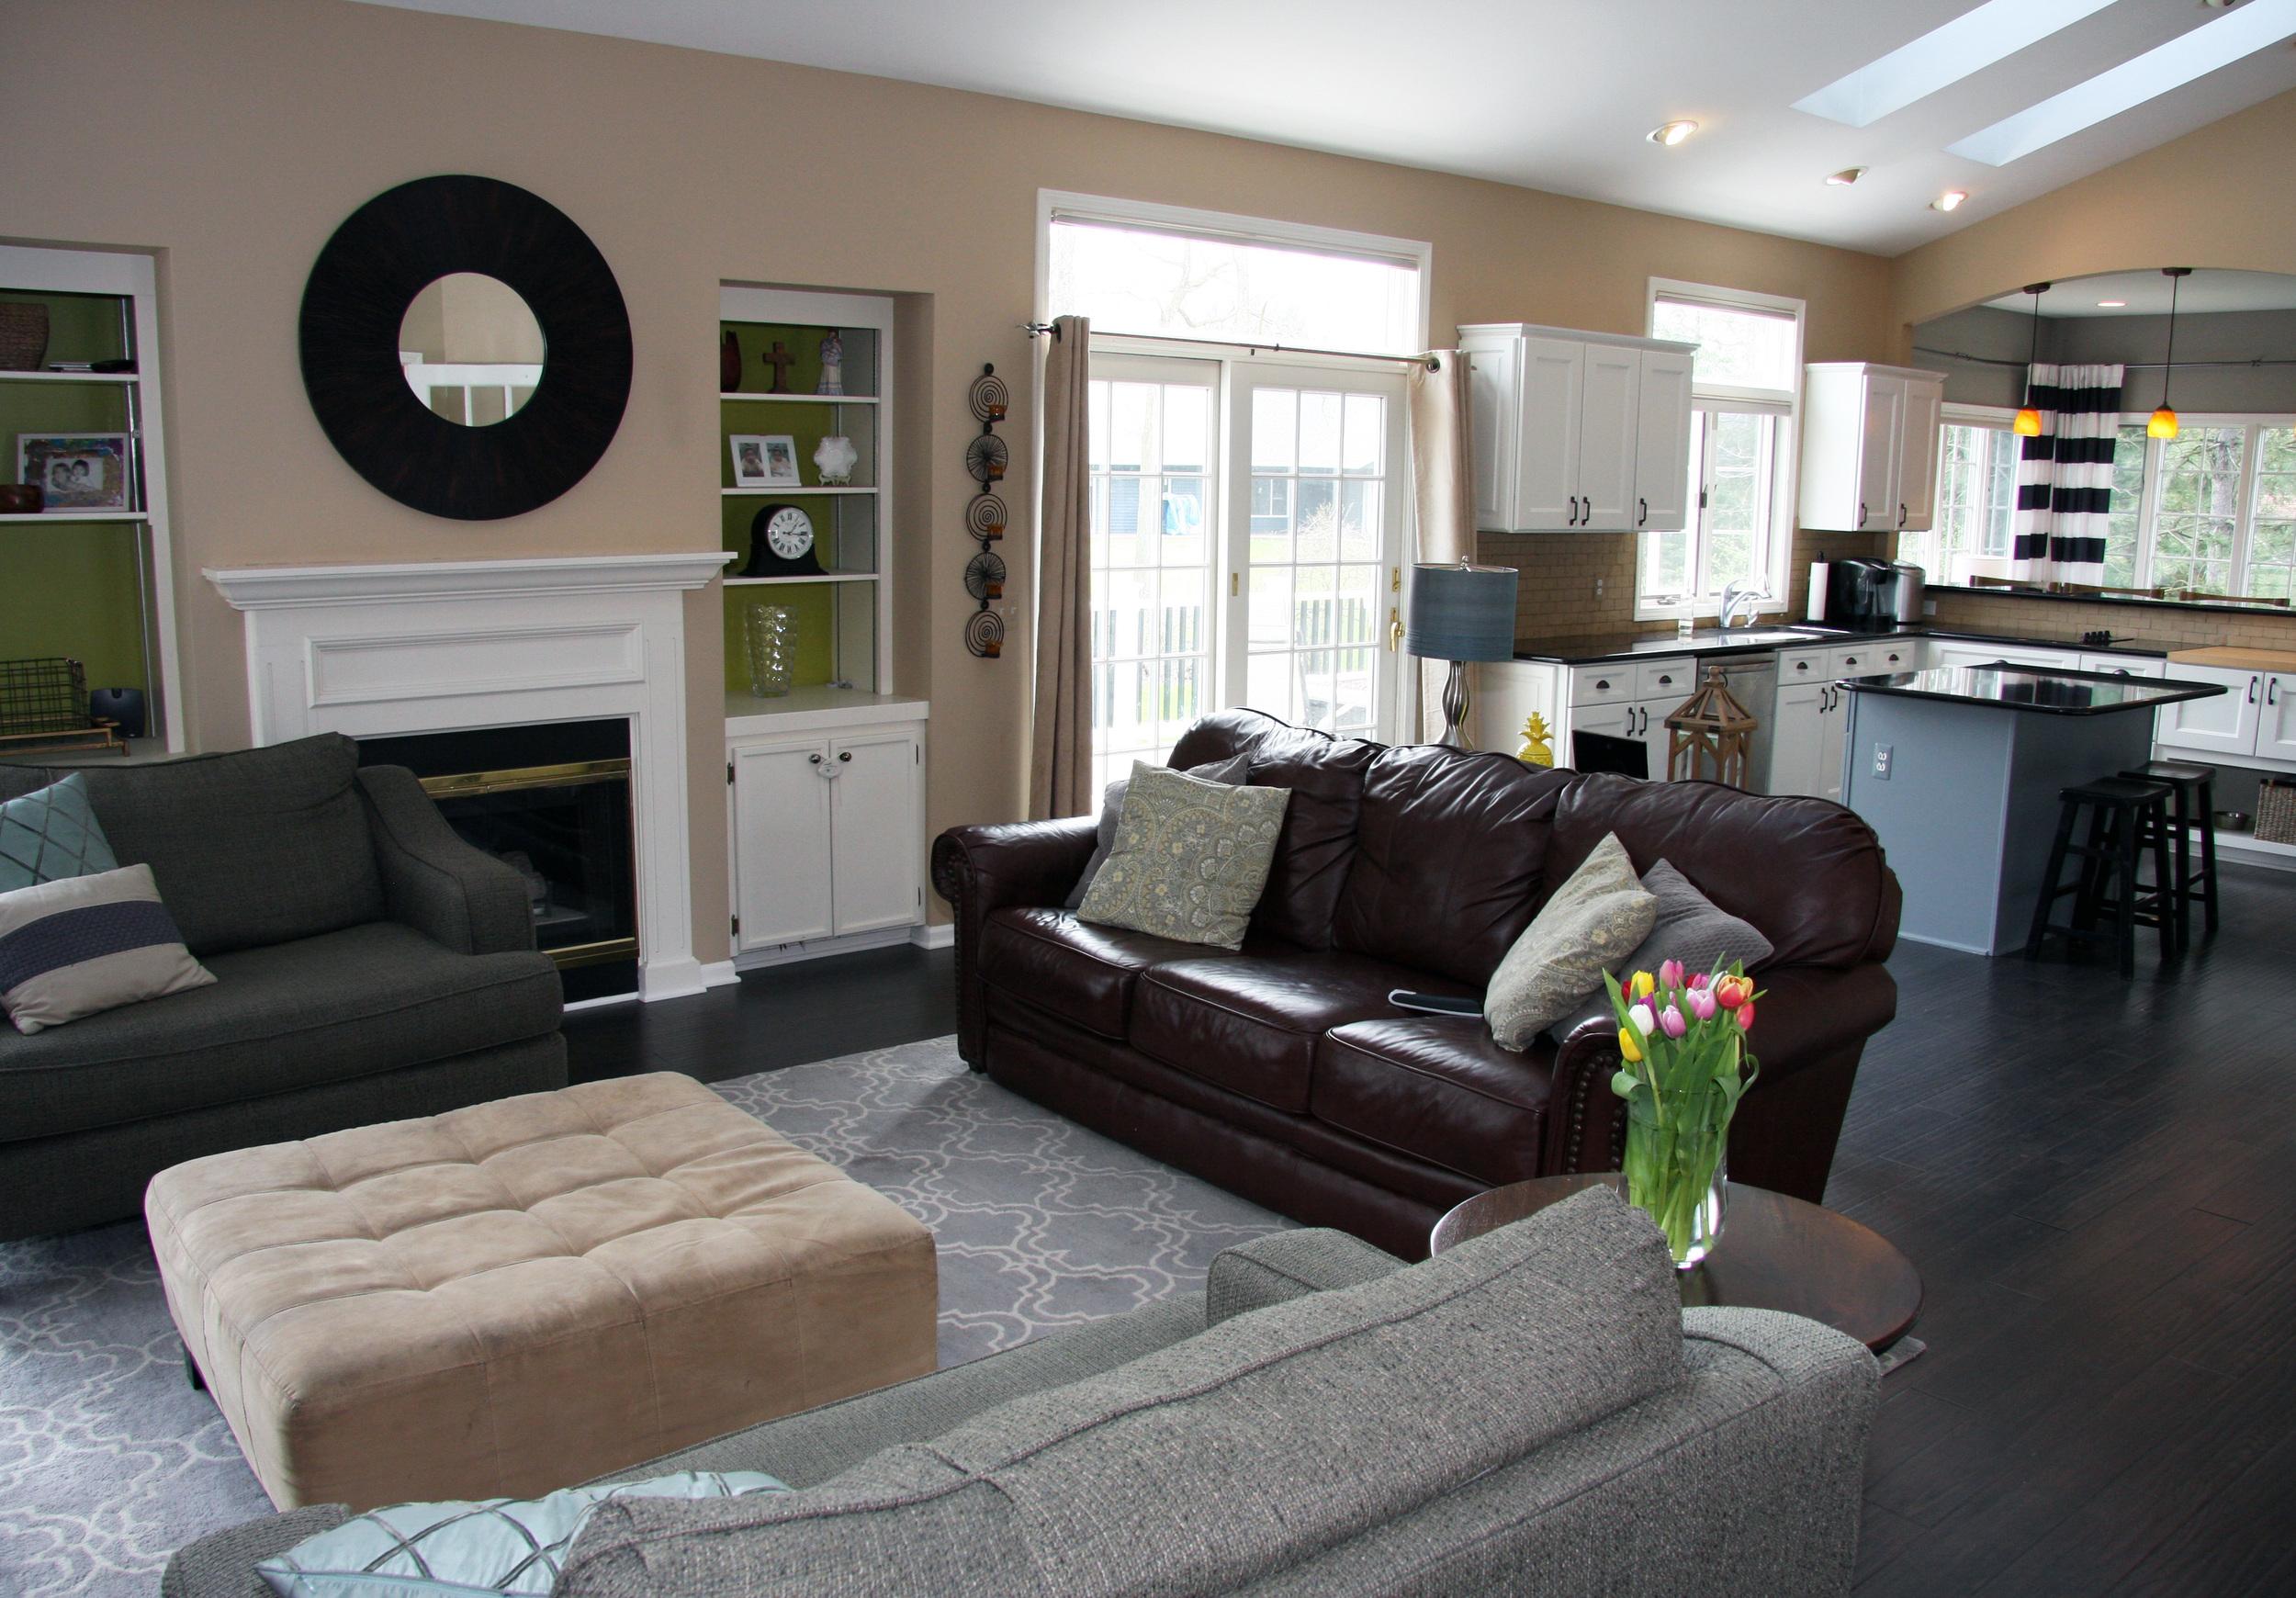 3772 Iris Drive SW, Grandville, MI - Beautiful home in prestigious neighborhood